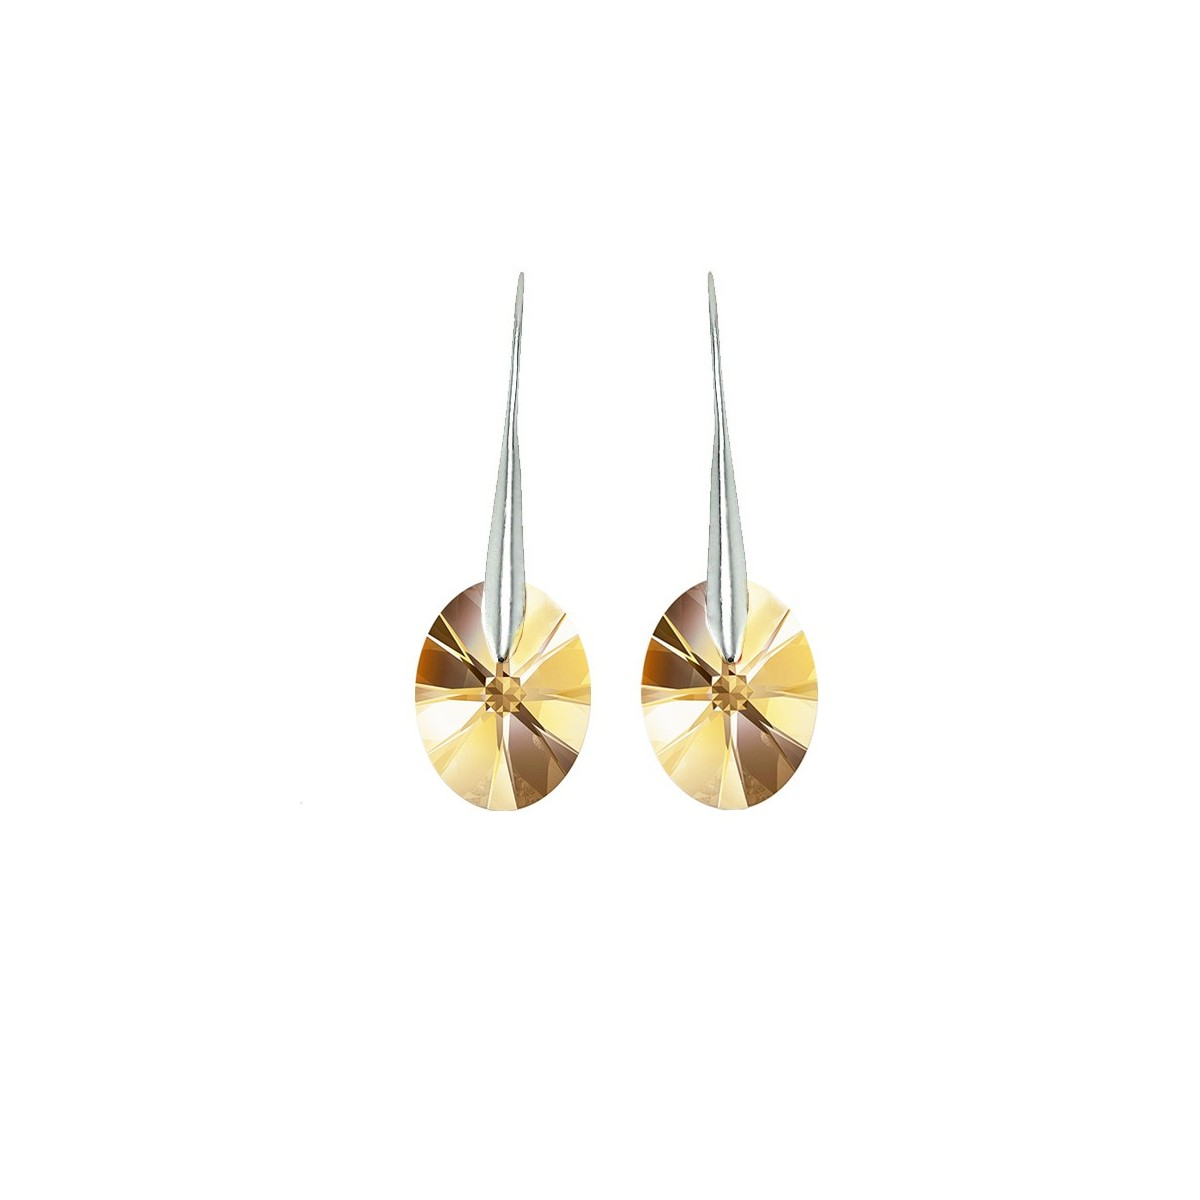 BS008-SE003-GOSH Boucles d'oreilles So Charm ornées d'un cristal golden shadow made with crystal from Swarovski